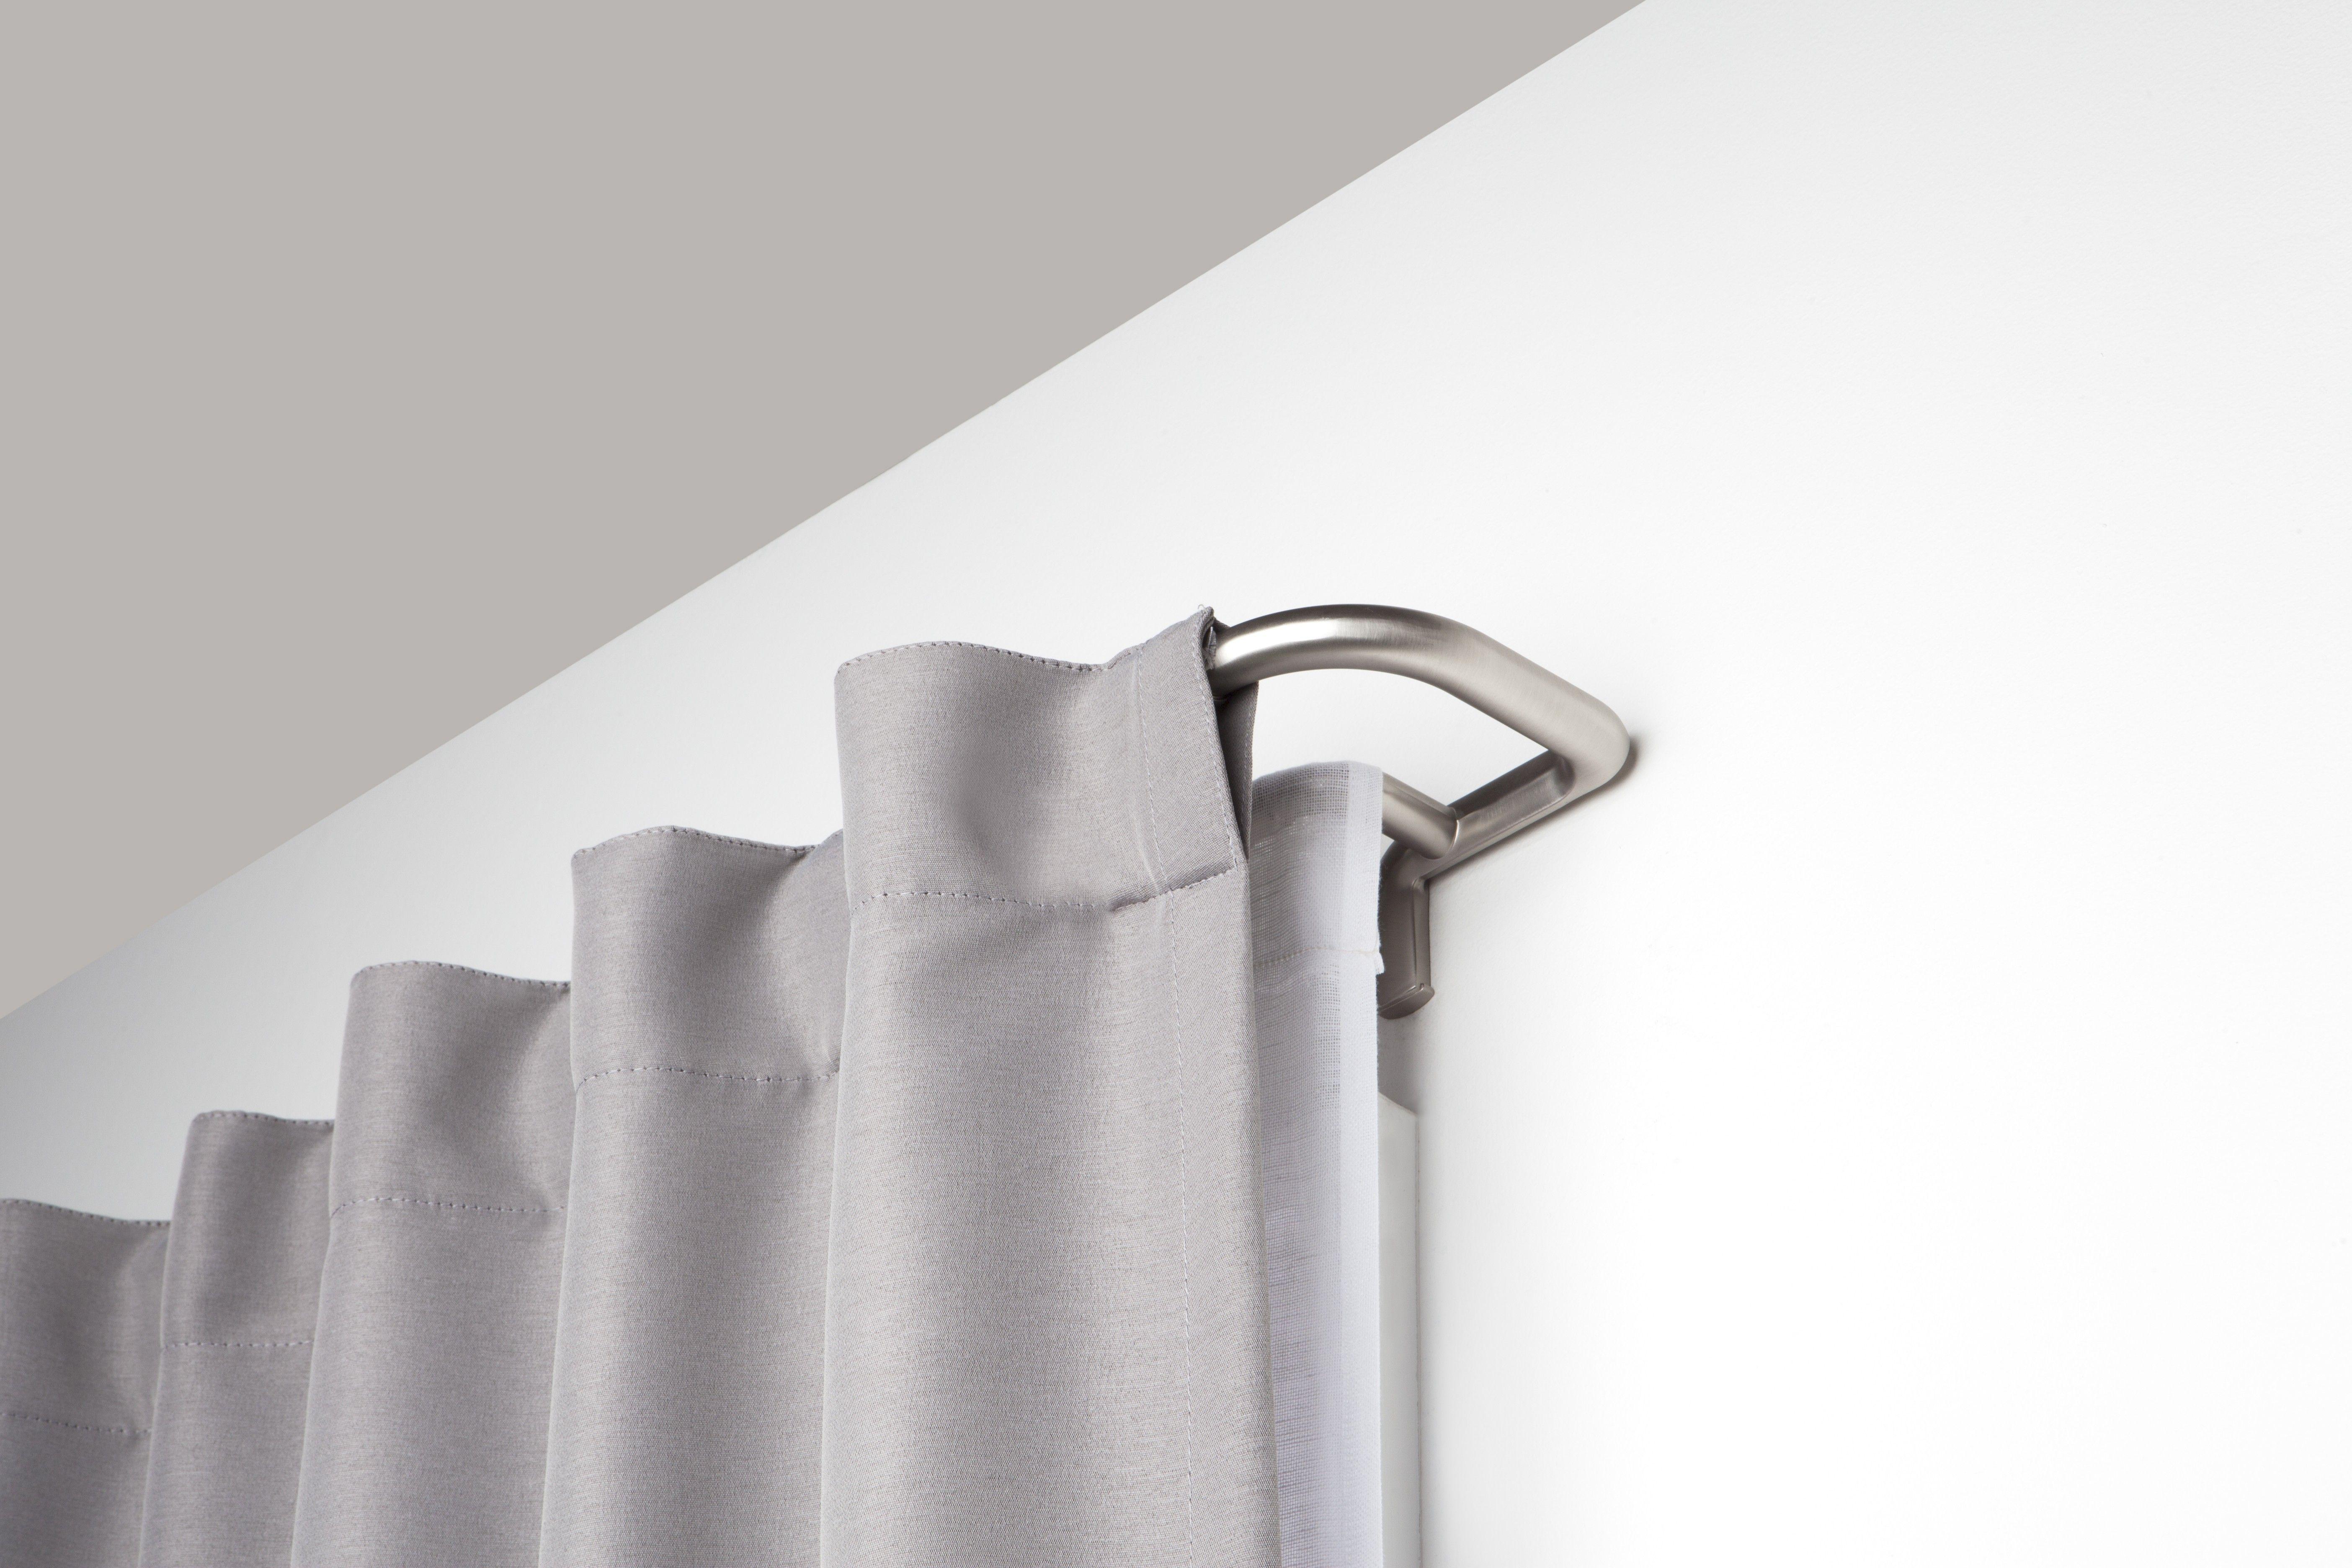 Twilight Double Curtain Rod Room Darkening Solution Nickel Double Rod Curtains Double Curtains Curtain Rods